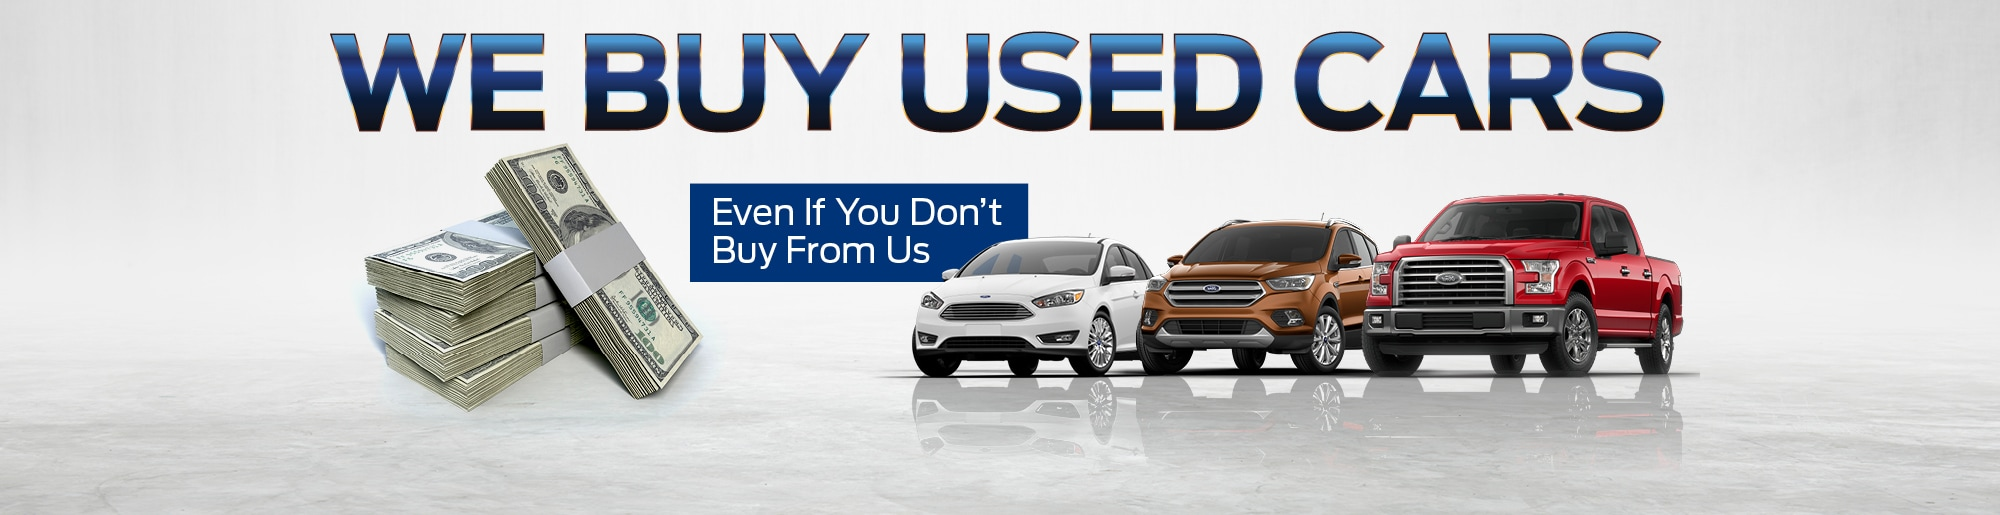 Bo Beuckman Quality Ford Ford Dealership Ellisville, MO